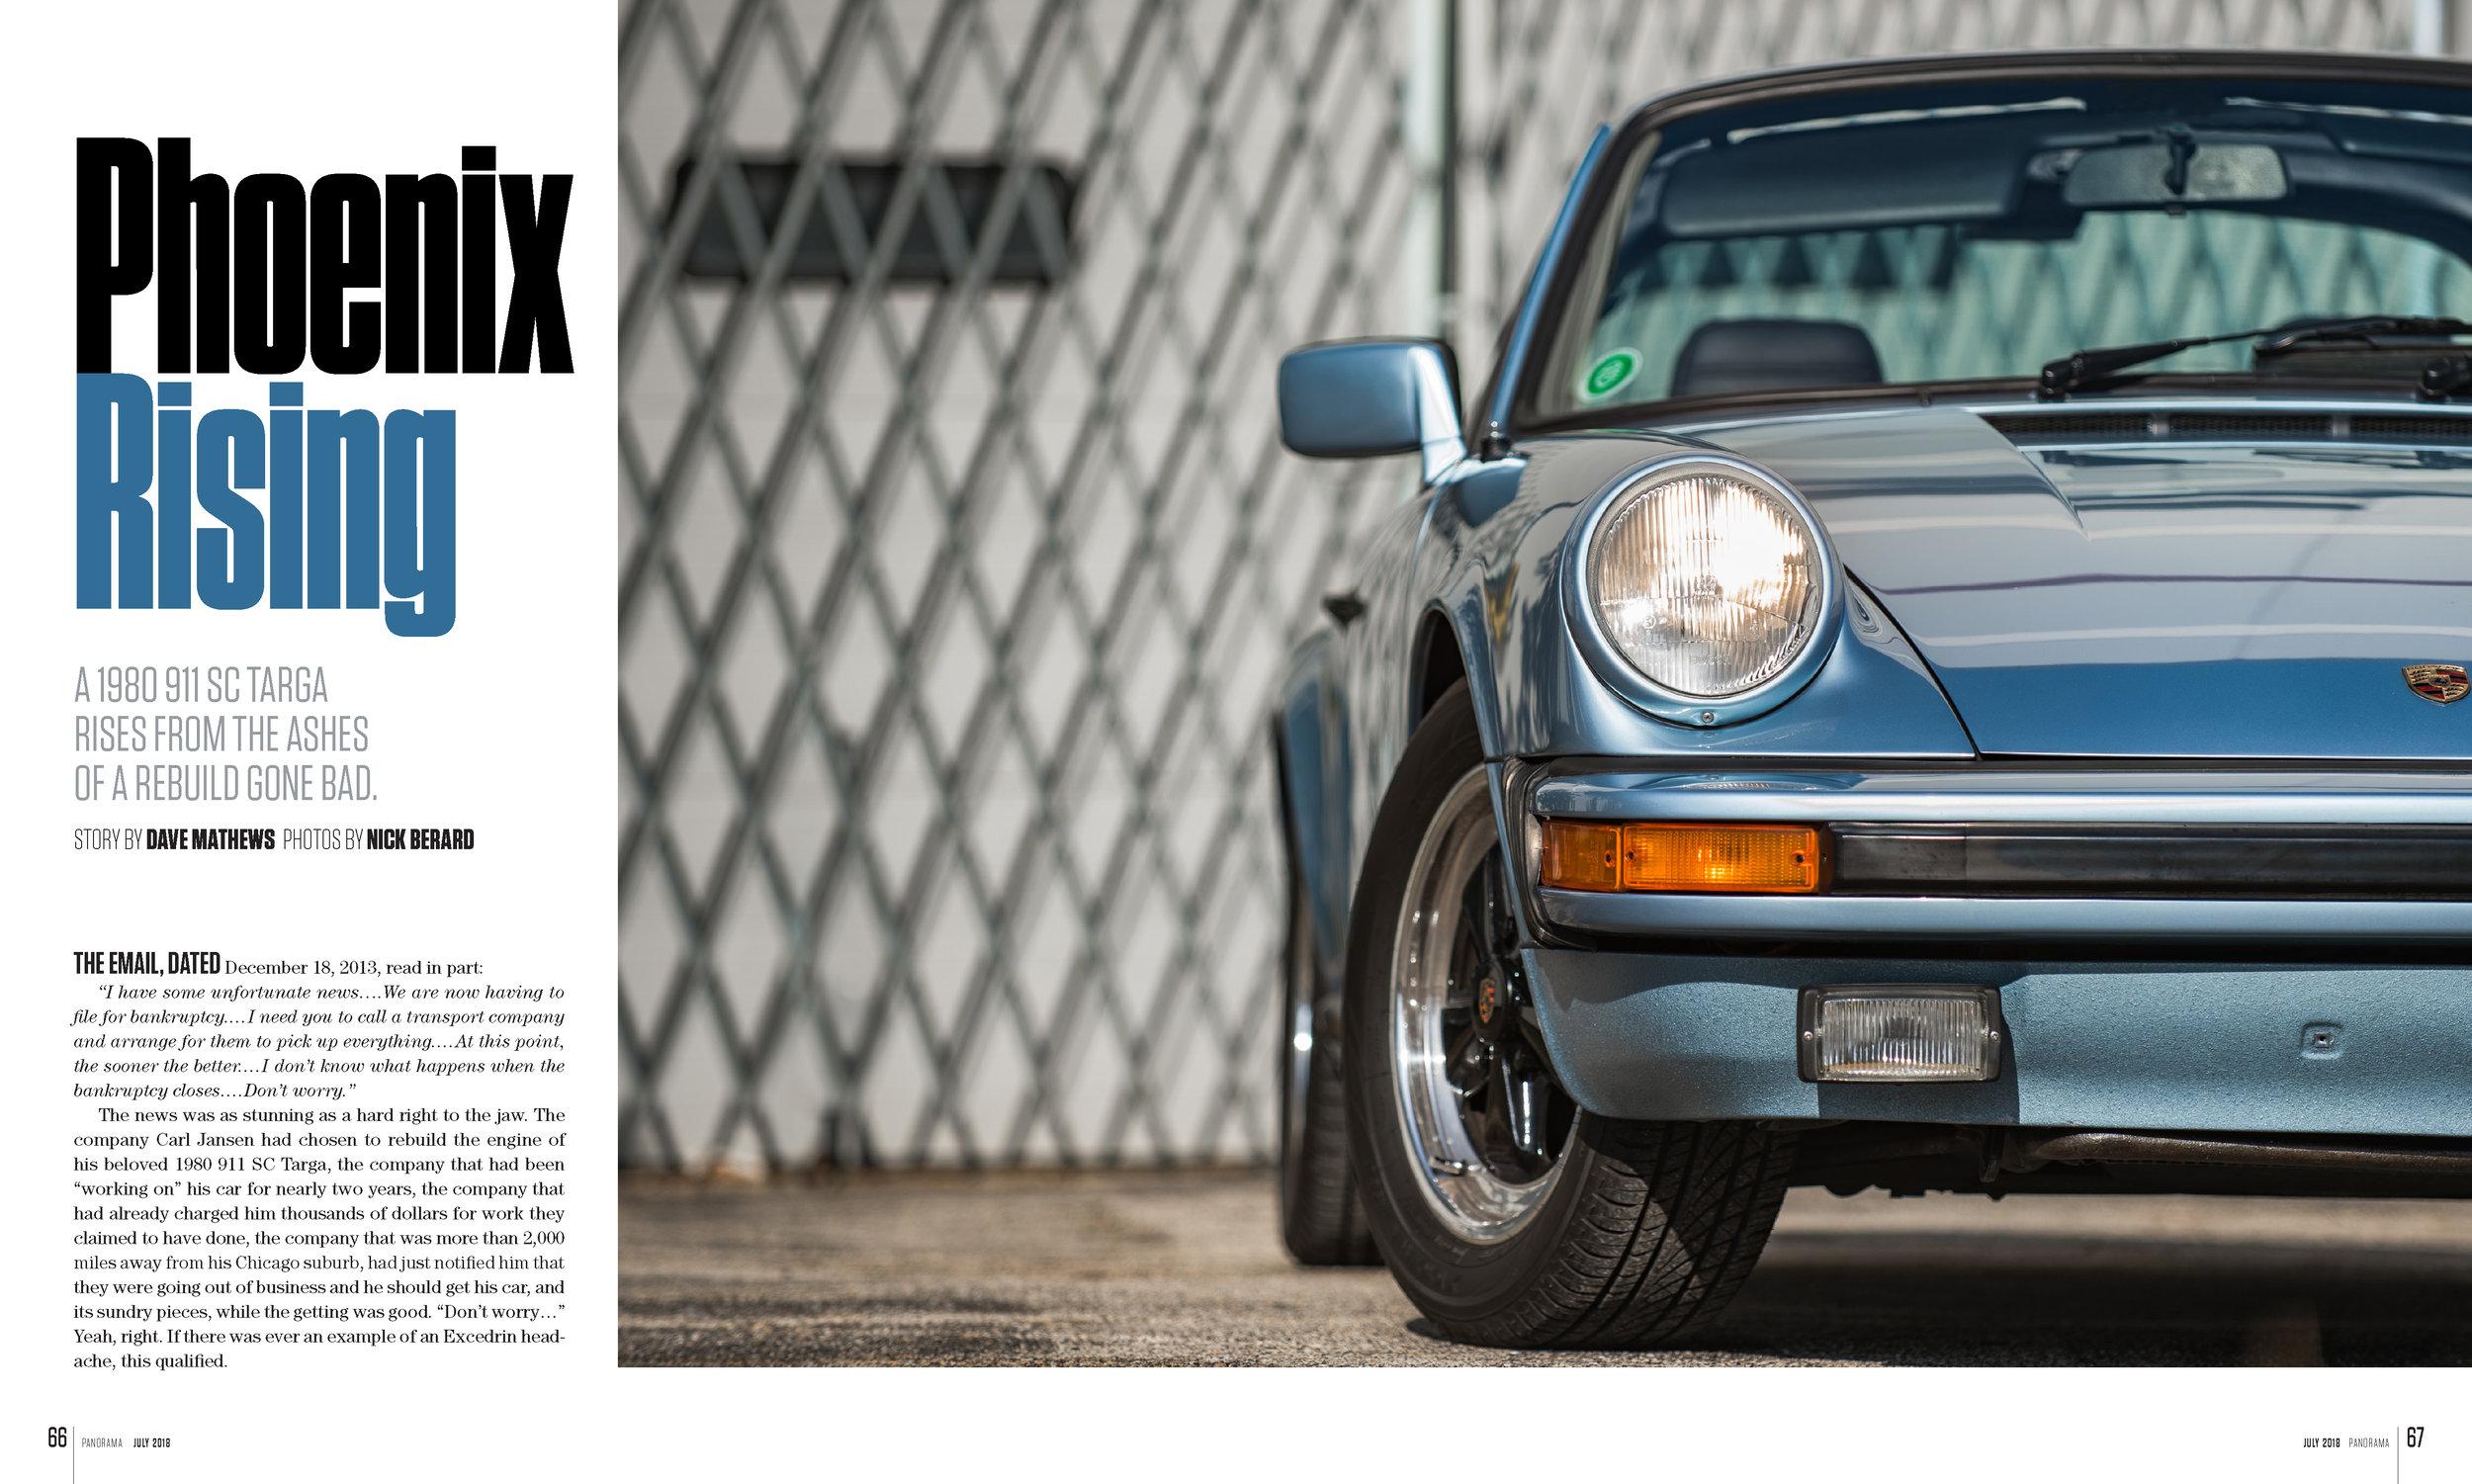 Porsche Panorama - Phoenix Rising - FULL ARTICLE